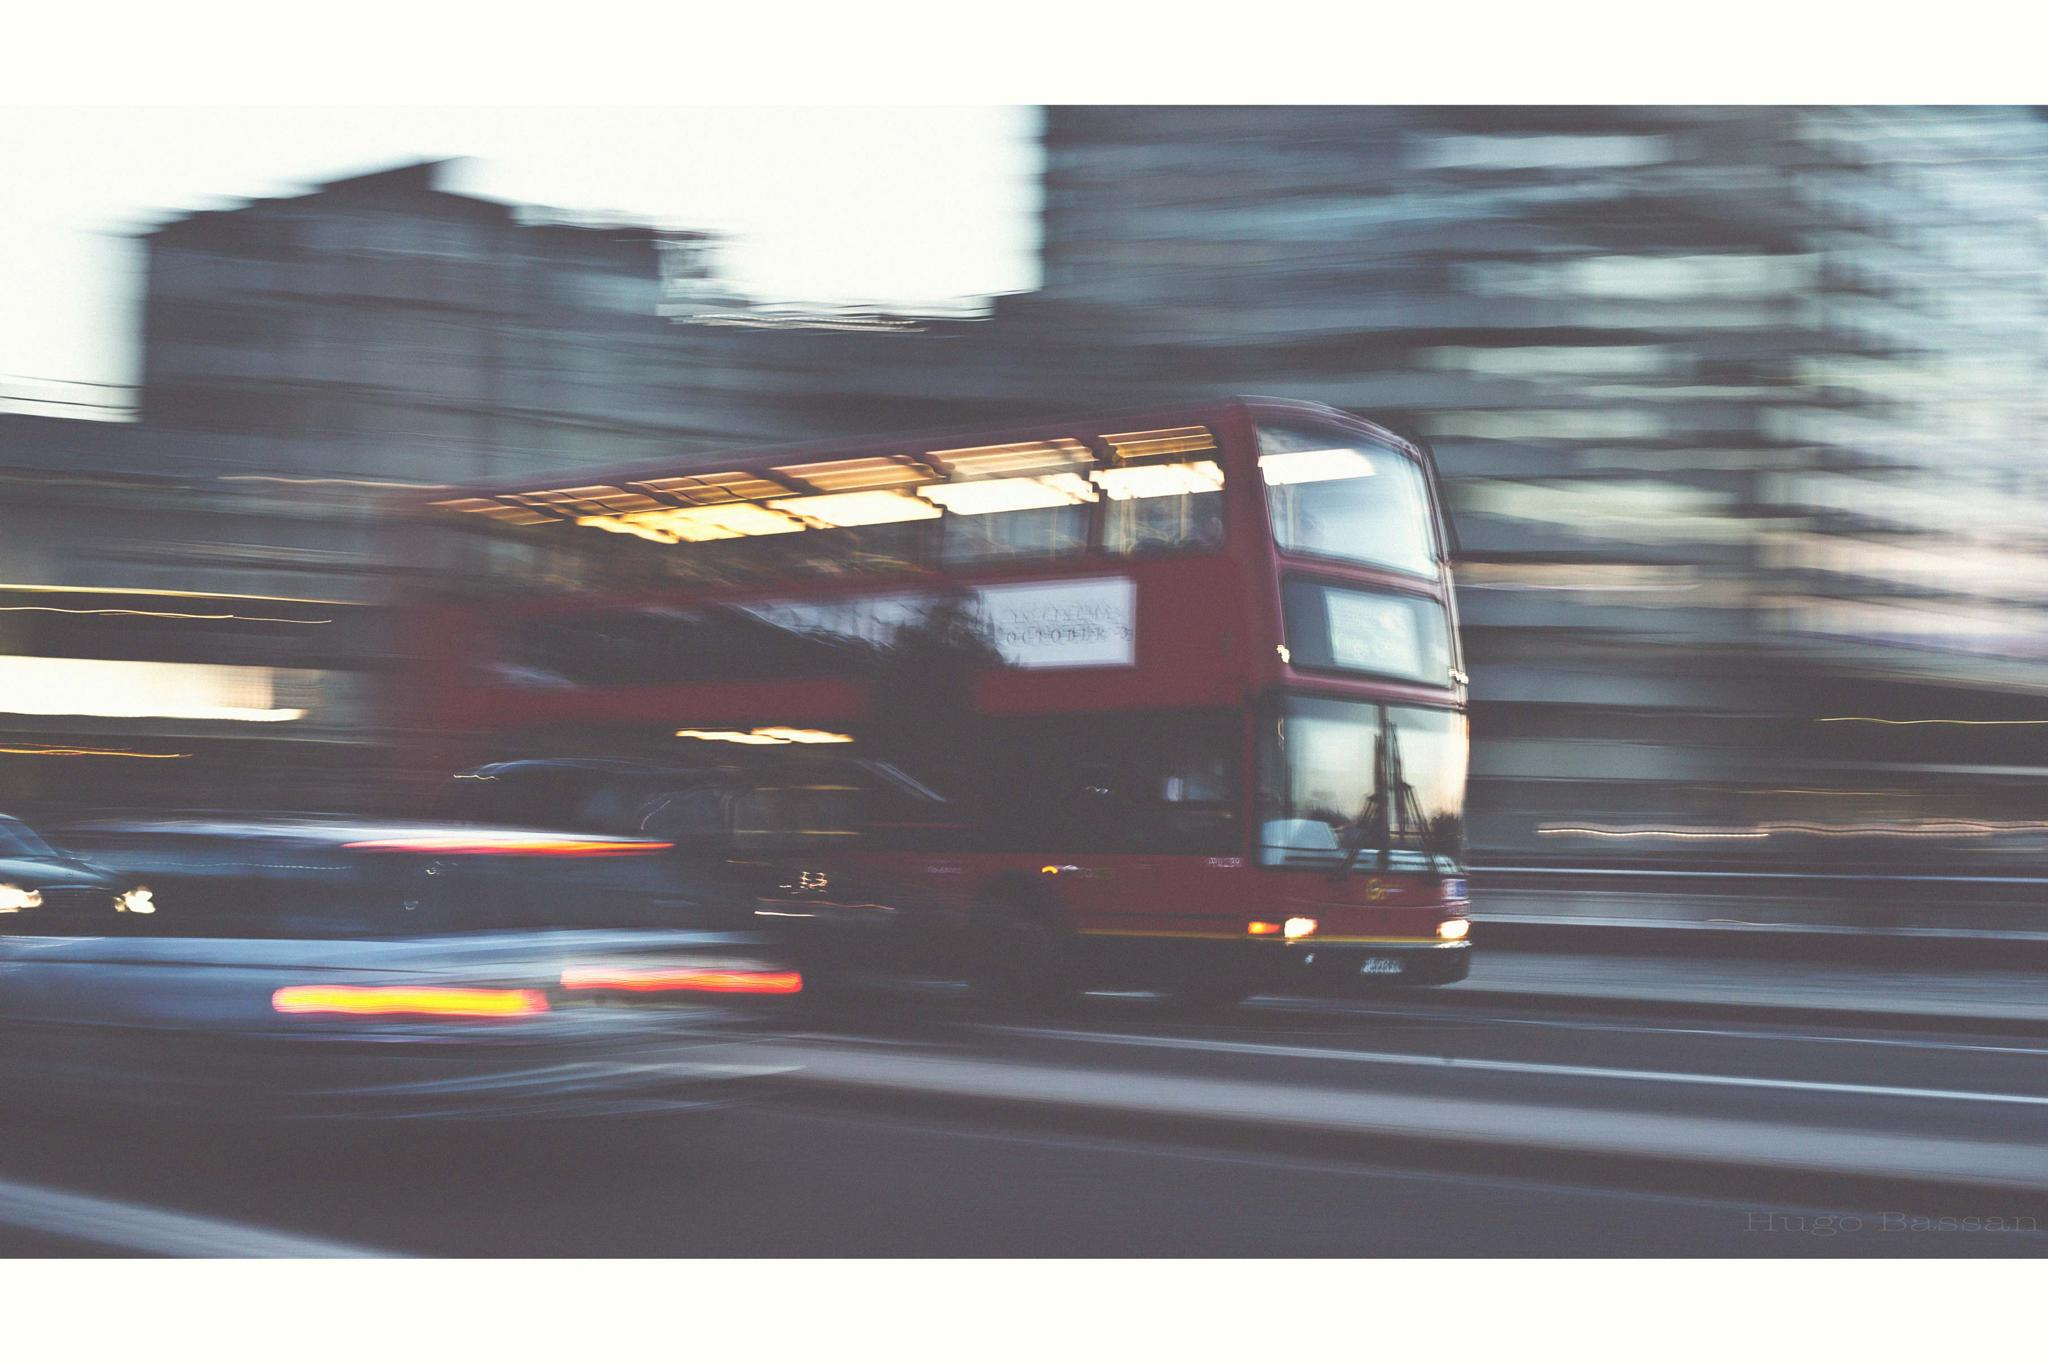 London Street by Hugo Bassan